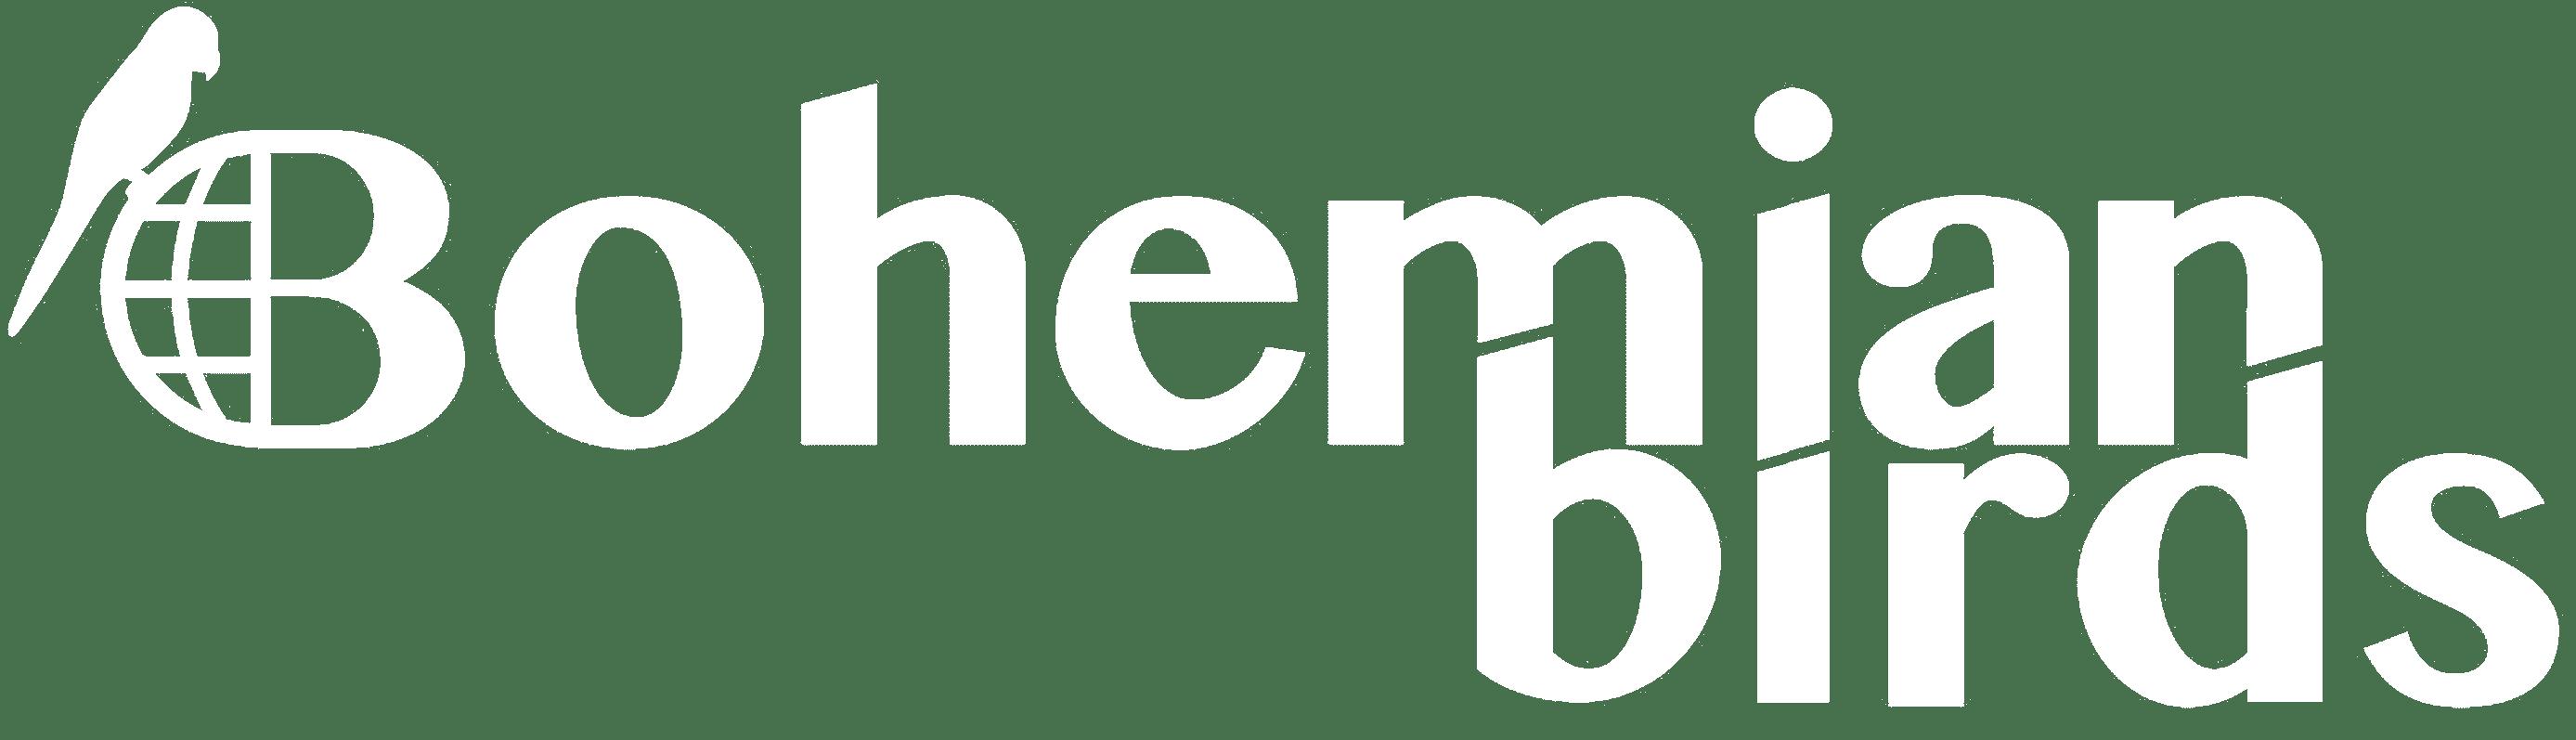 bb logo wit